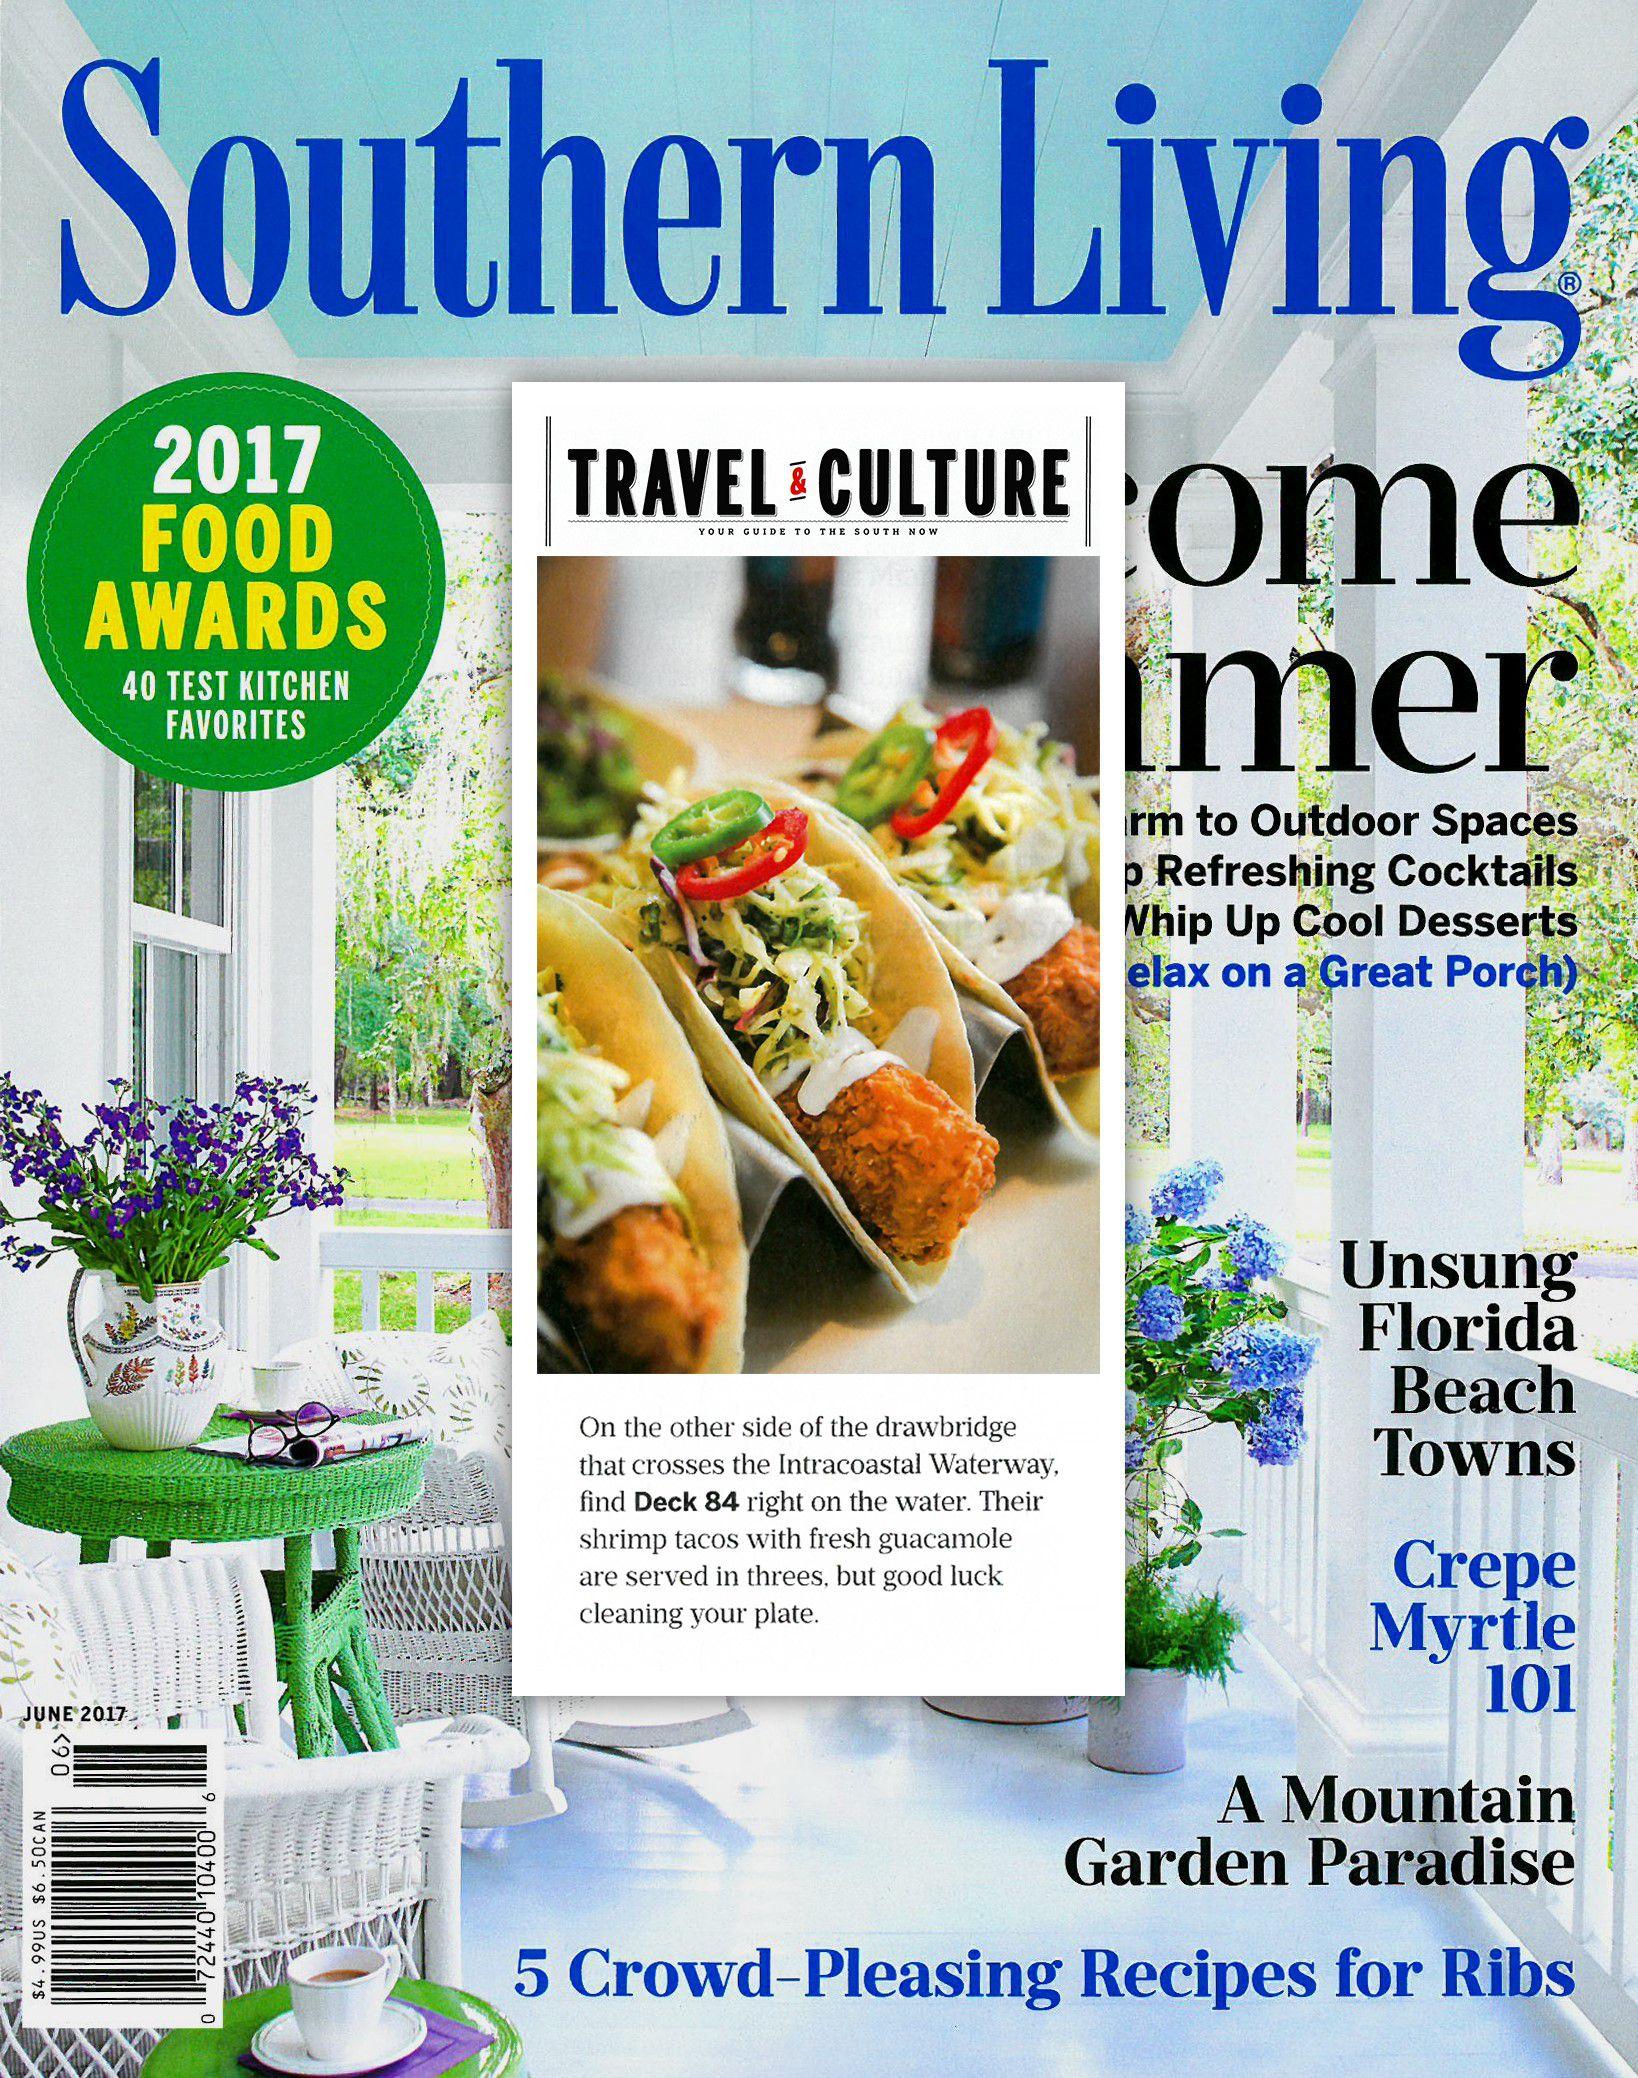 Souther Living - June 2016 - Deck 84.jpg